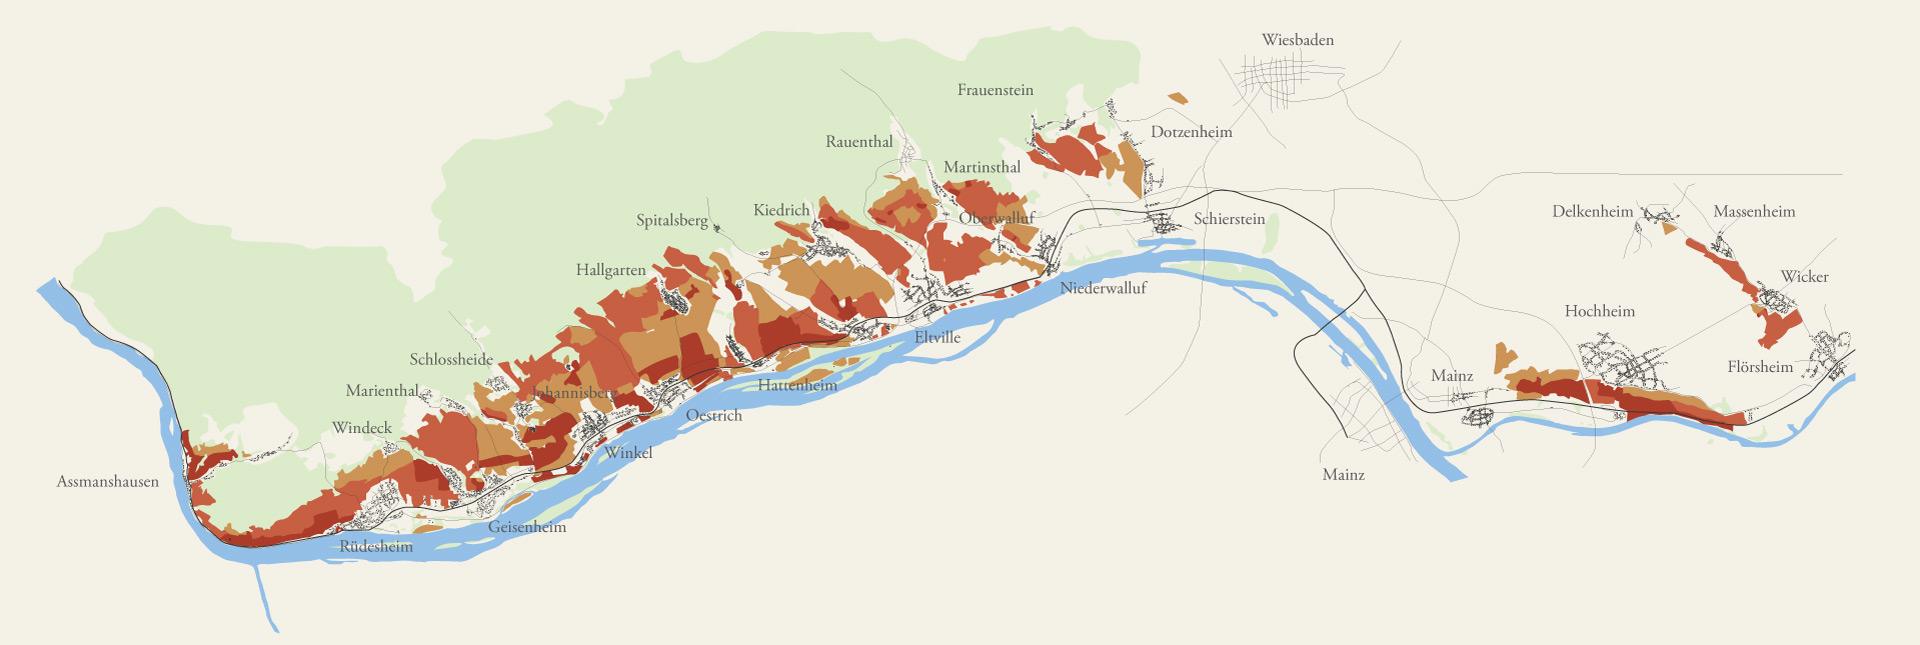 Karte der Weinberge im Rheingau